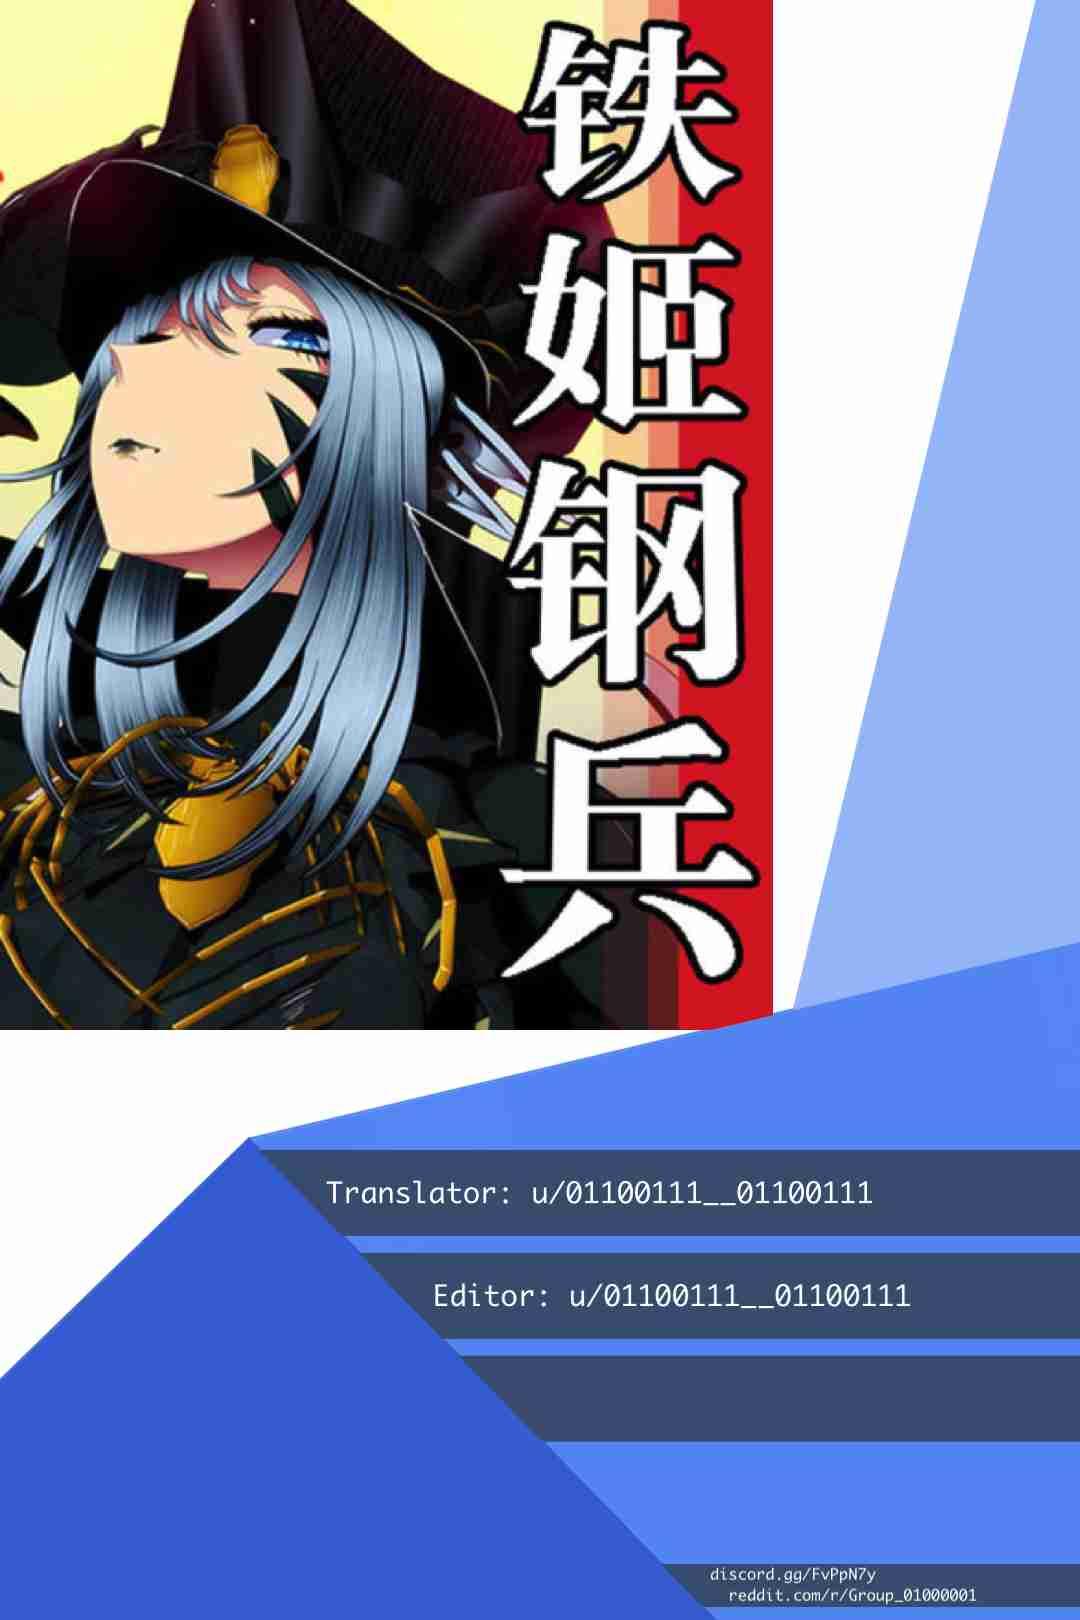 https://manga.mangadogs.com/comics/pic2/59/24443/736650/1987e87cf9837d2c008fb15a9351dad1.jpg Page 1